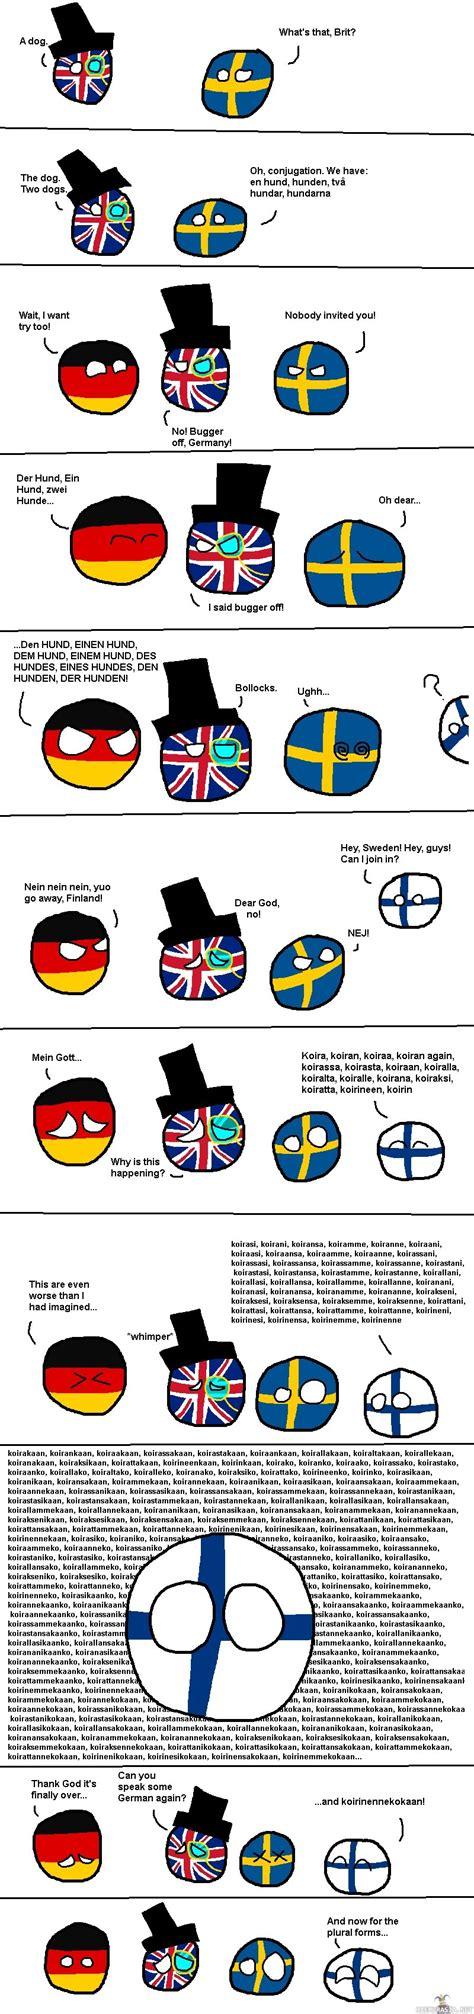 Finnish Meme - koira sanan erimuodot